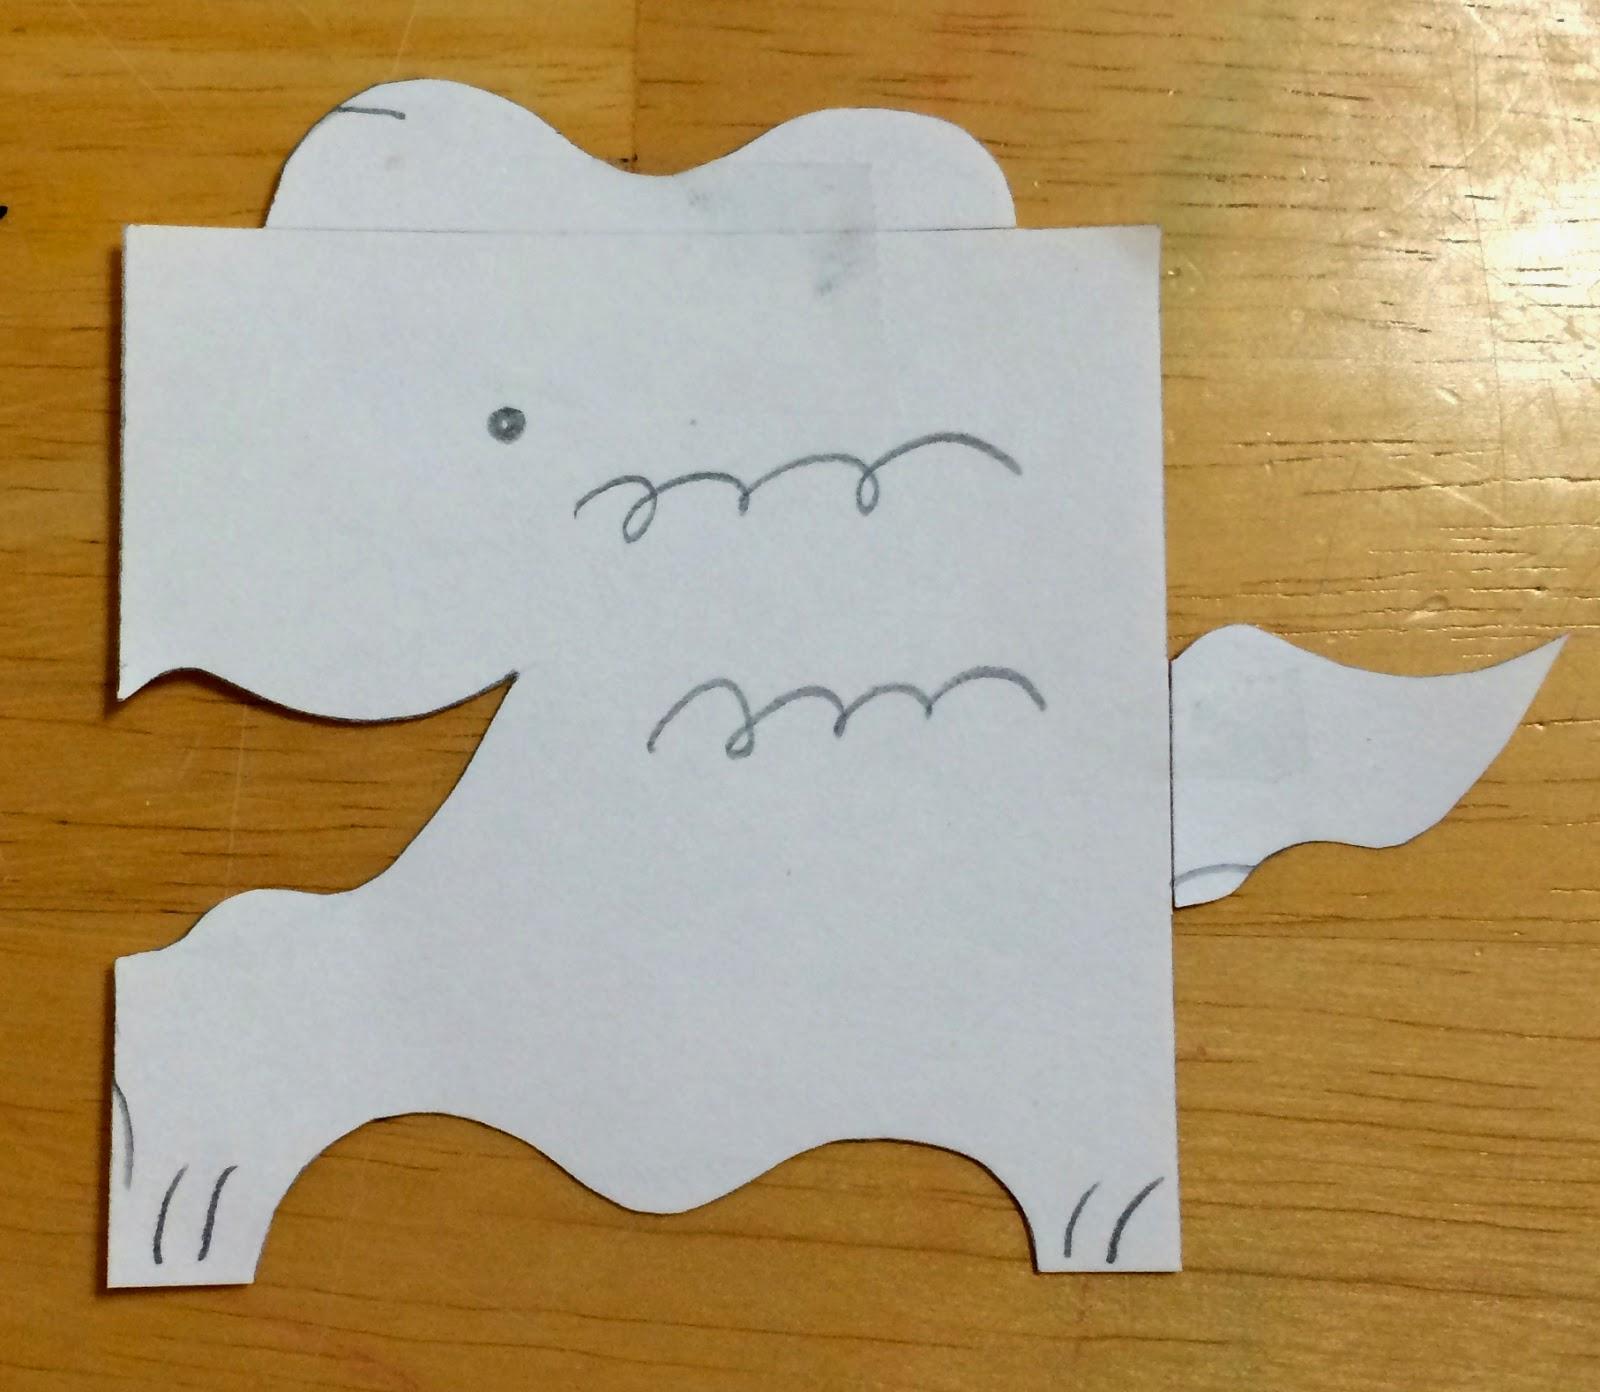 tessellating shapes templates - kathy 39 s angelnik designs art project ideas imagination